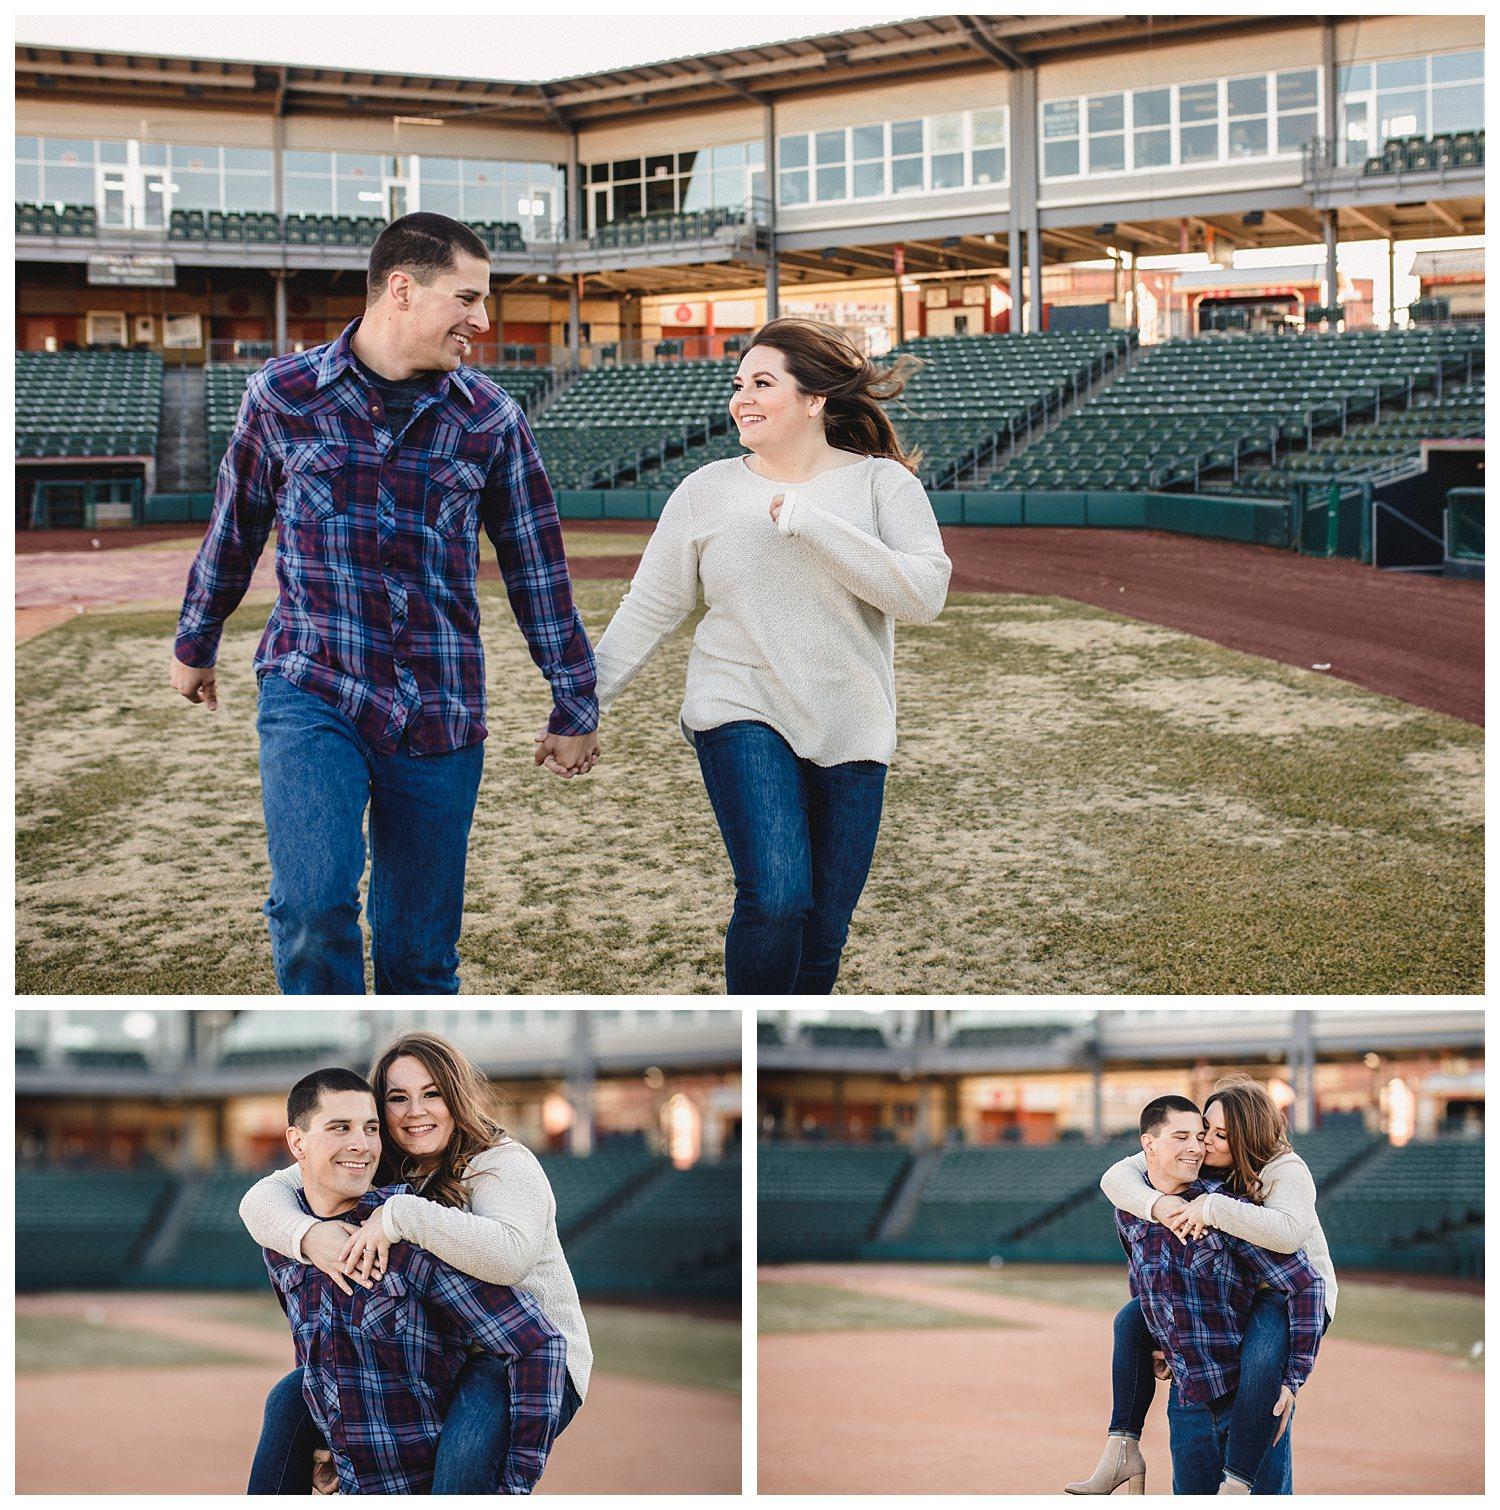 Kelsey_Diane_Photography_T-Bones_Stadium_Kansas_Wandering_Adventourus_Kansas_City_Engagement_0095.jpg